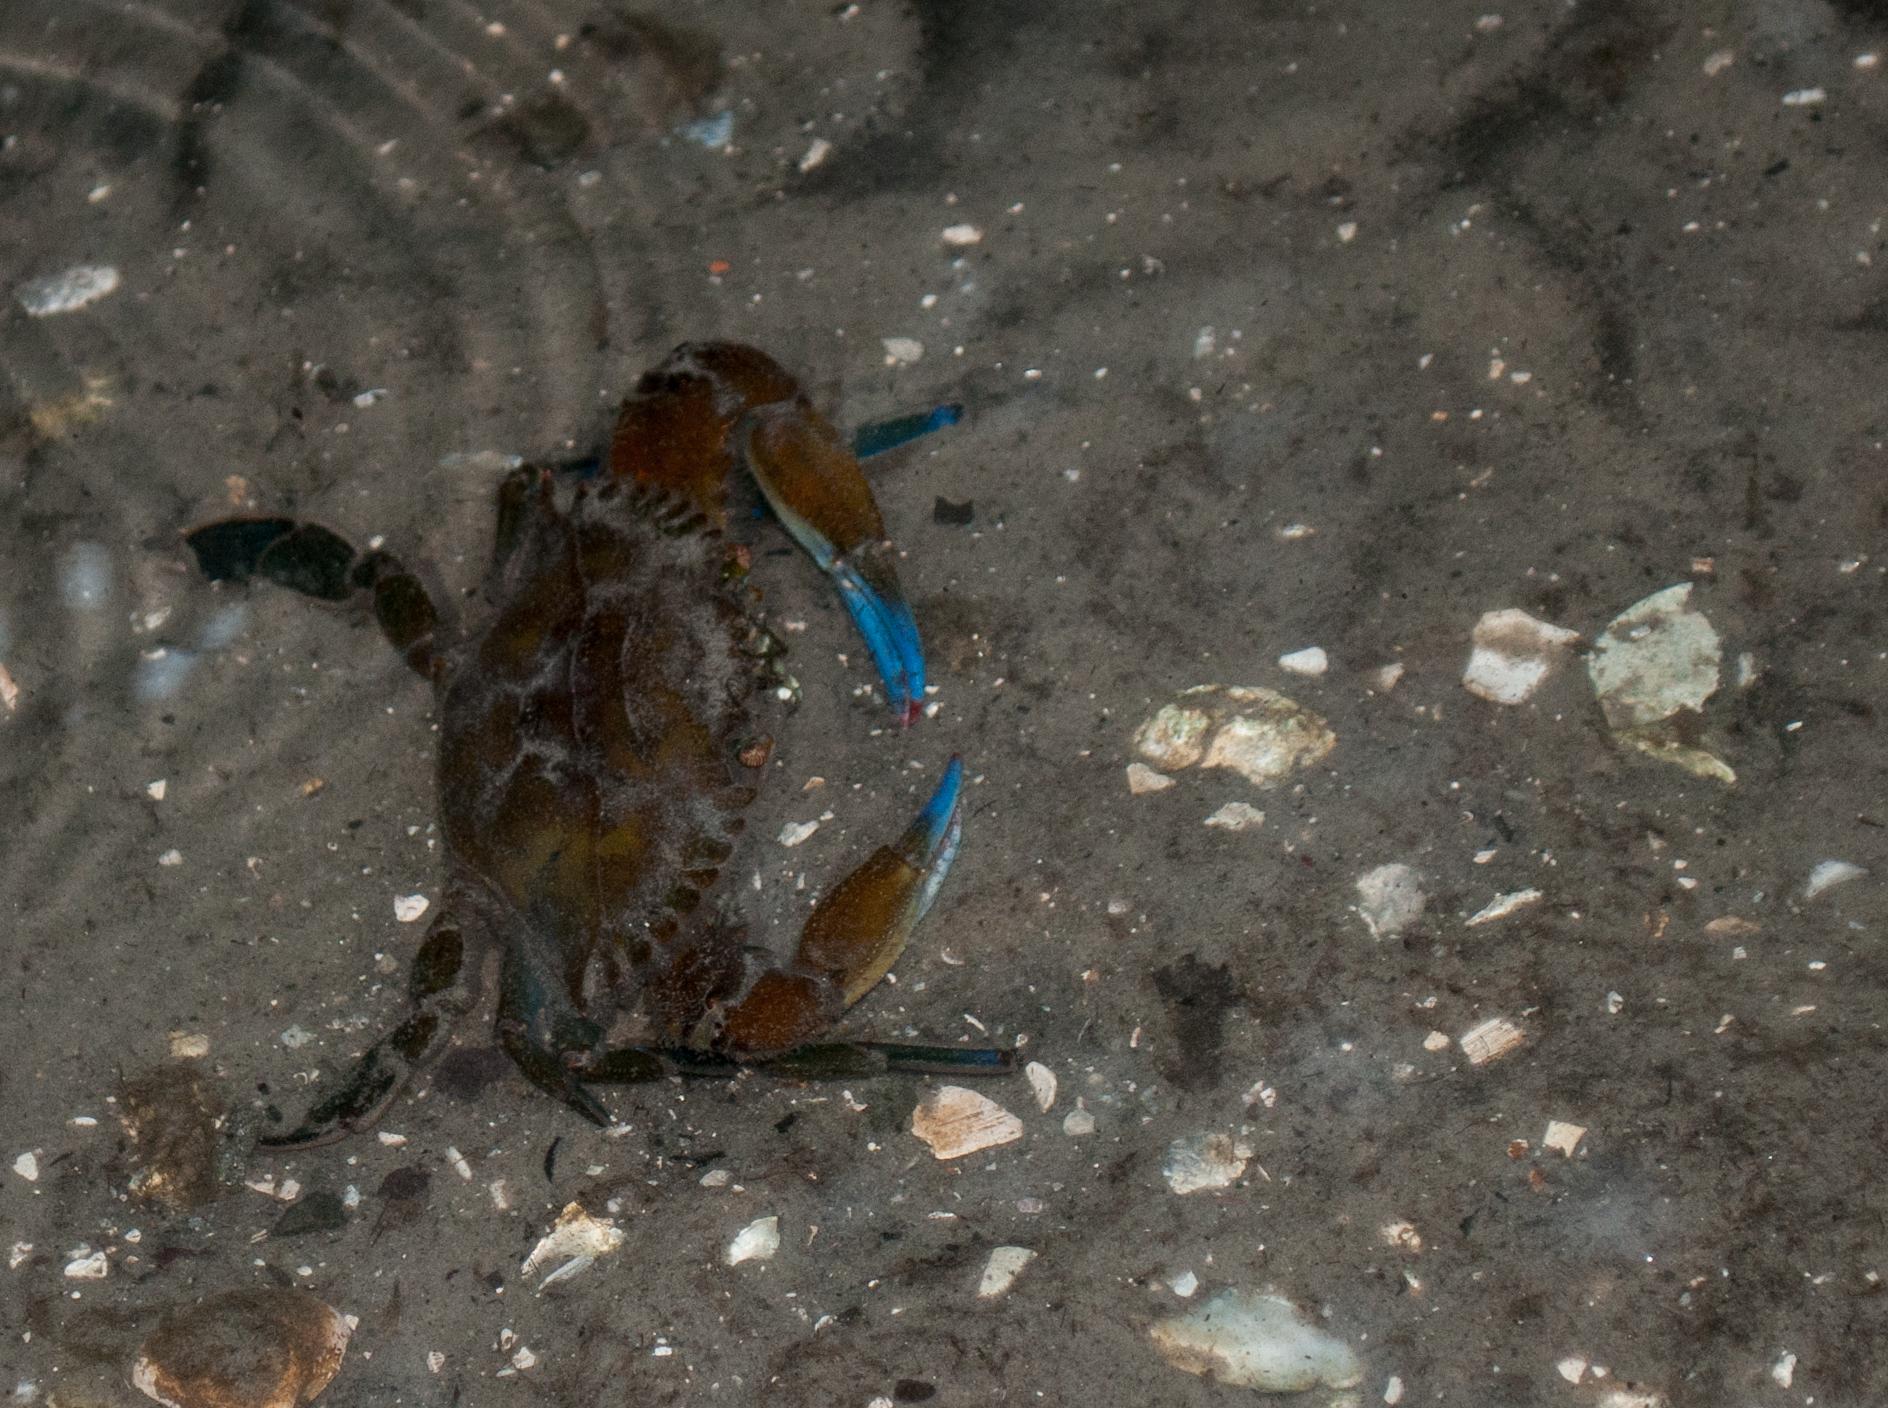 Image of rugose swimming crab